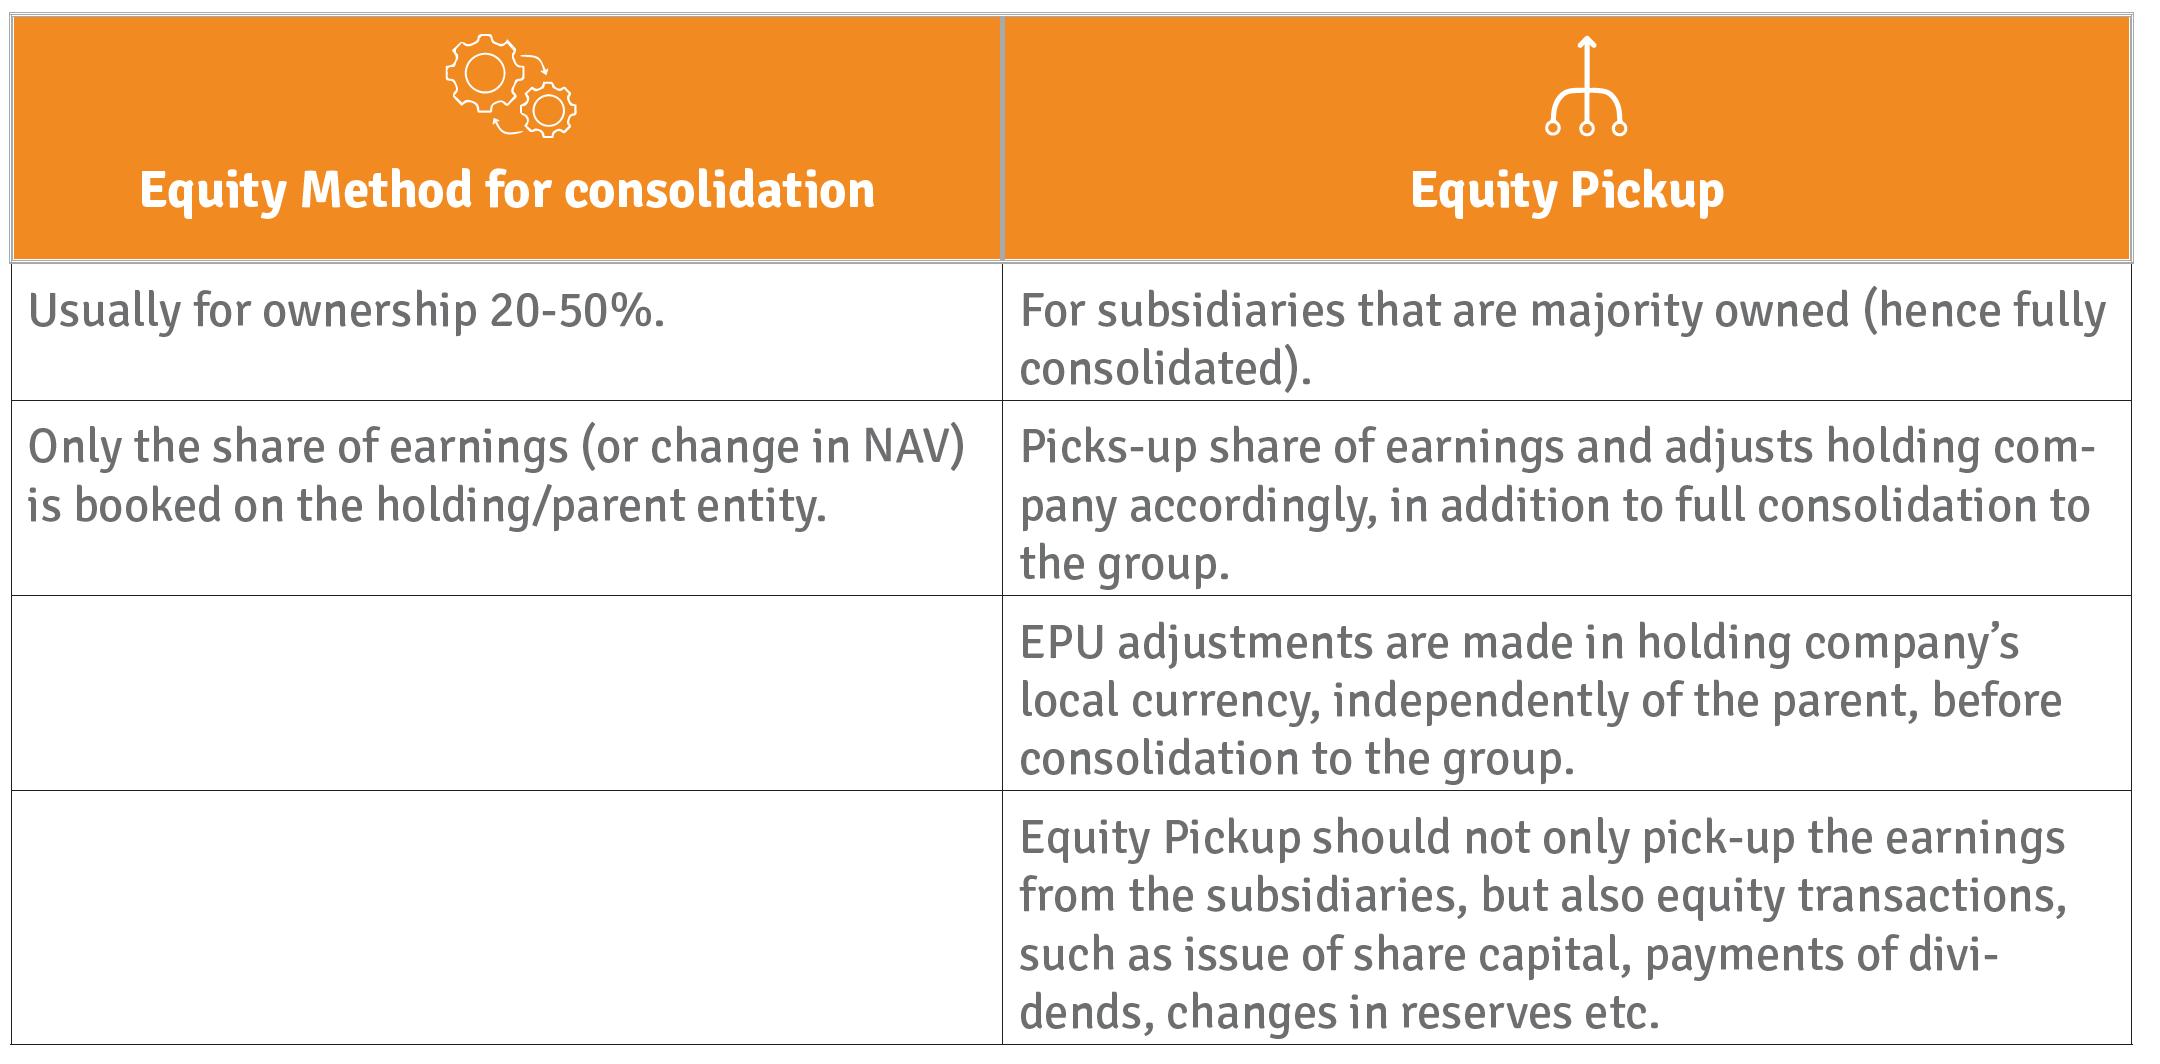 Equity Pickup